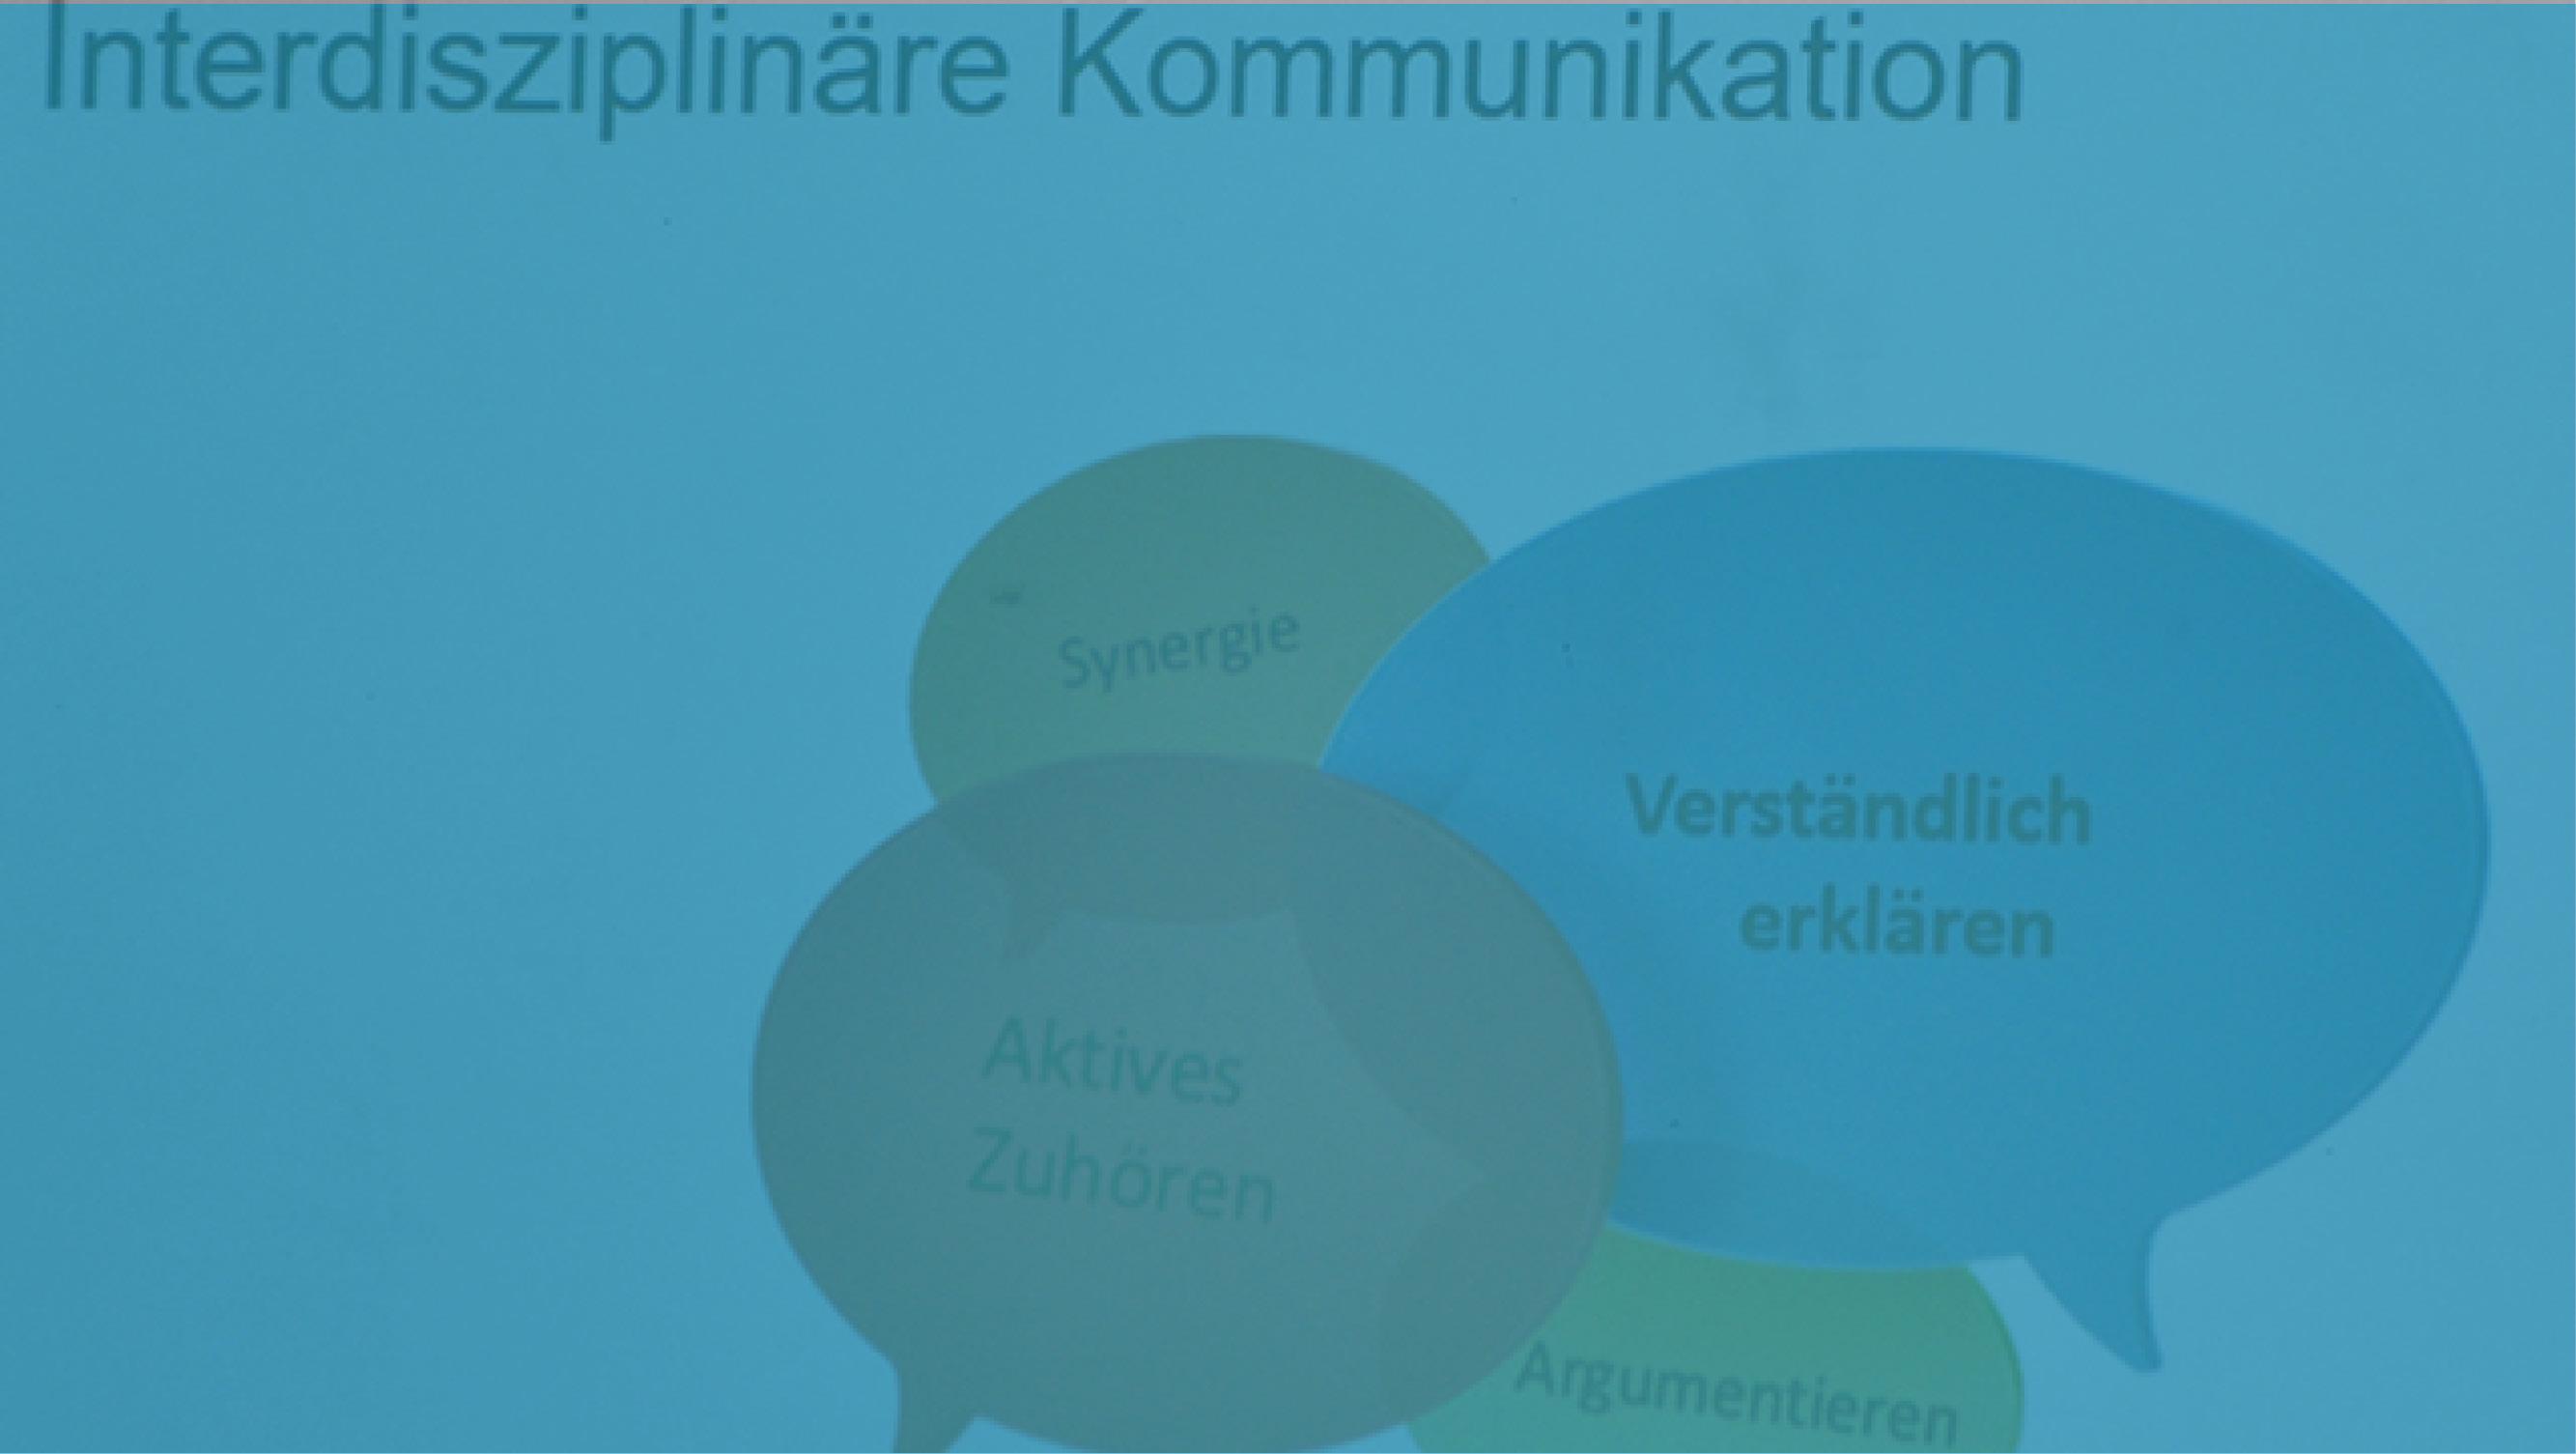 Ausschnitt aus Präsentation zum Thema Interdisziplinäre Kommunikation